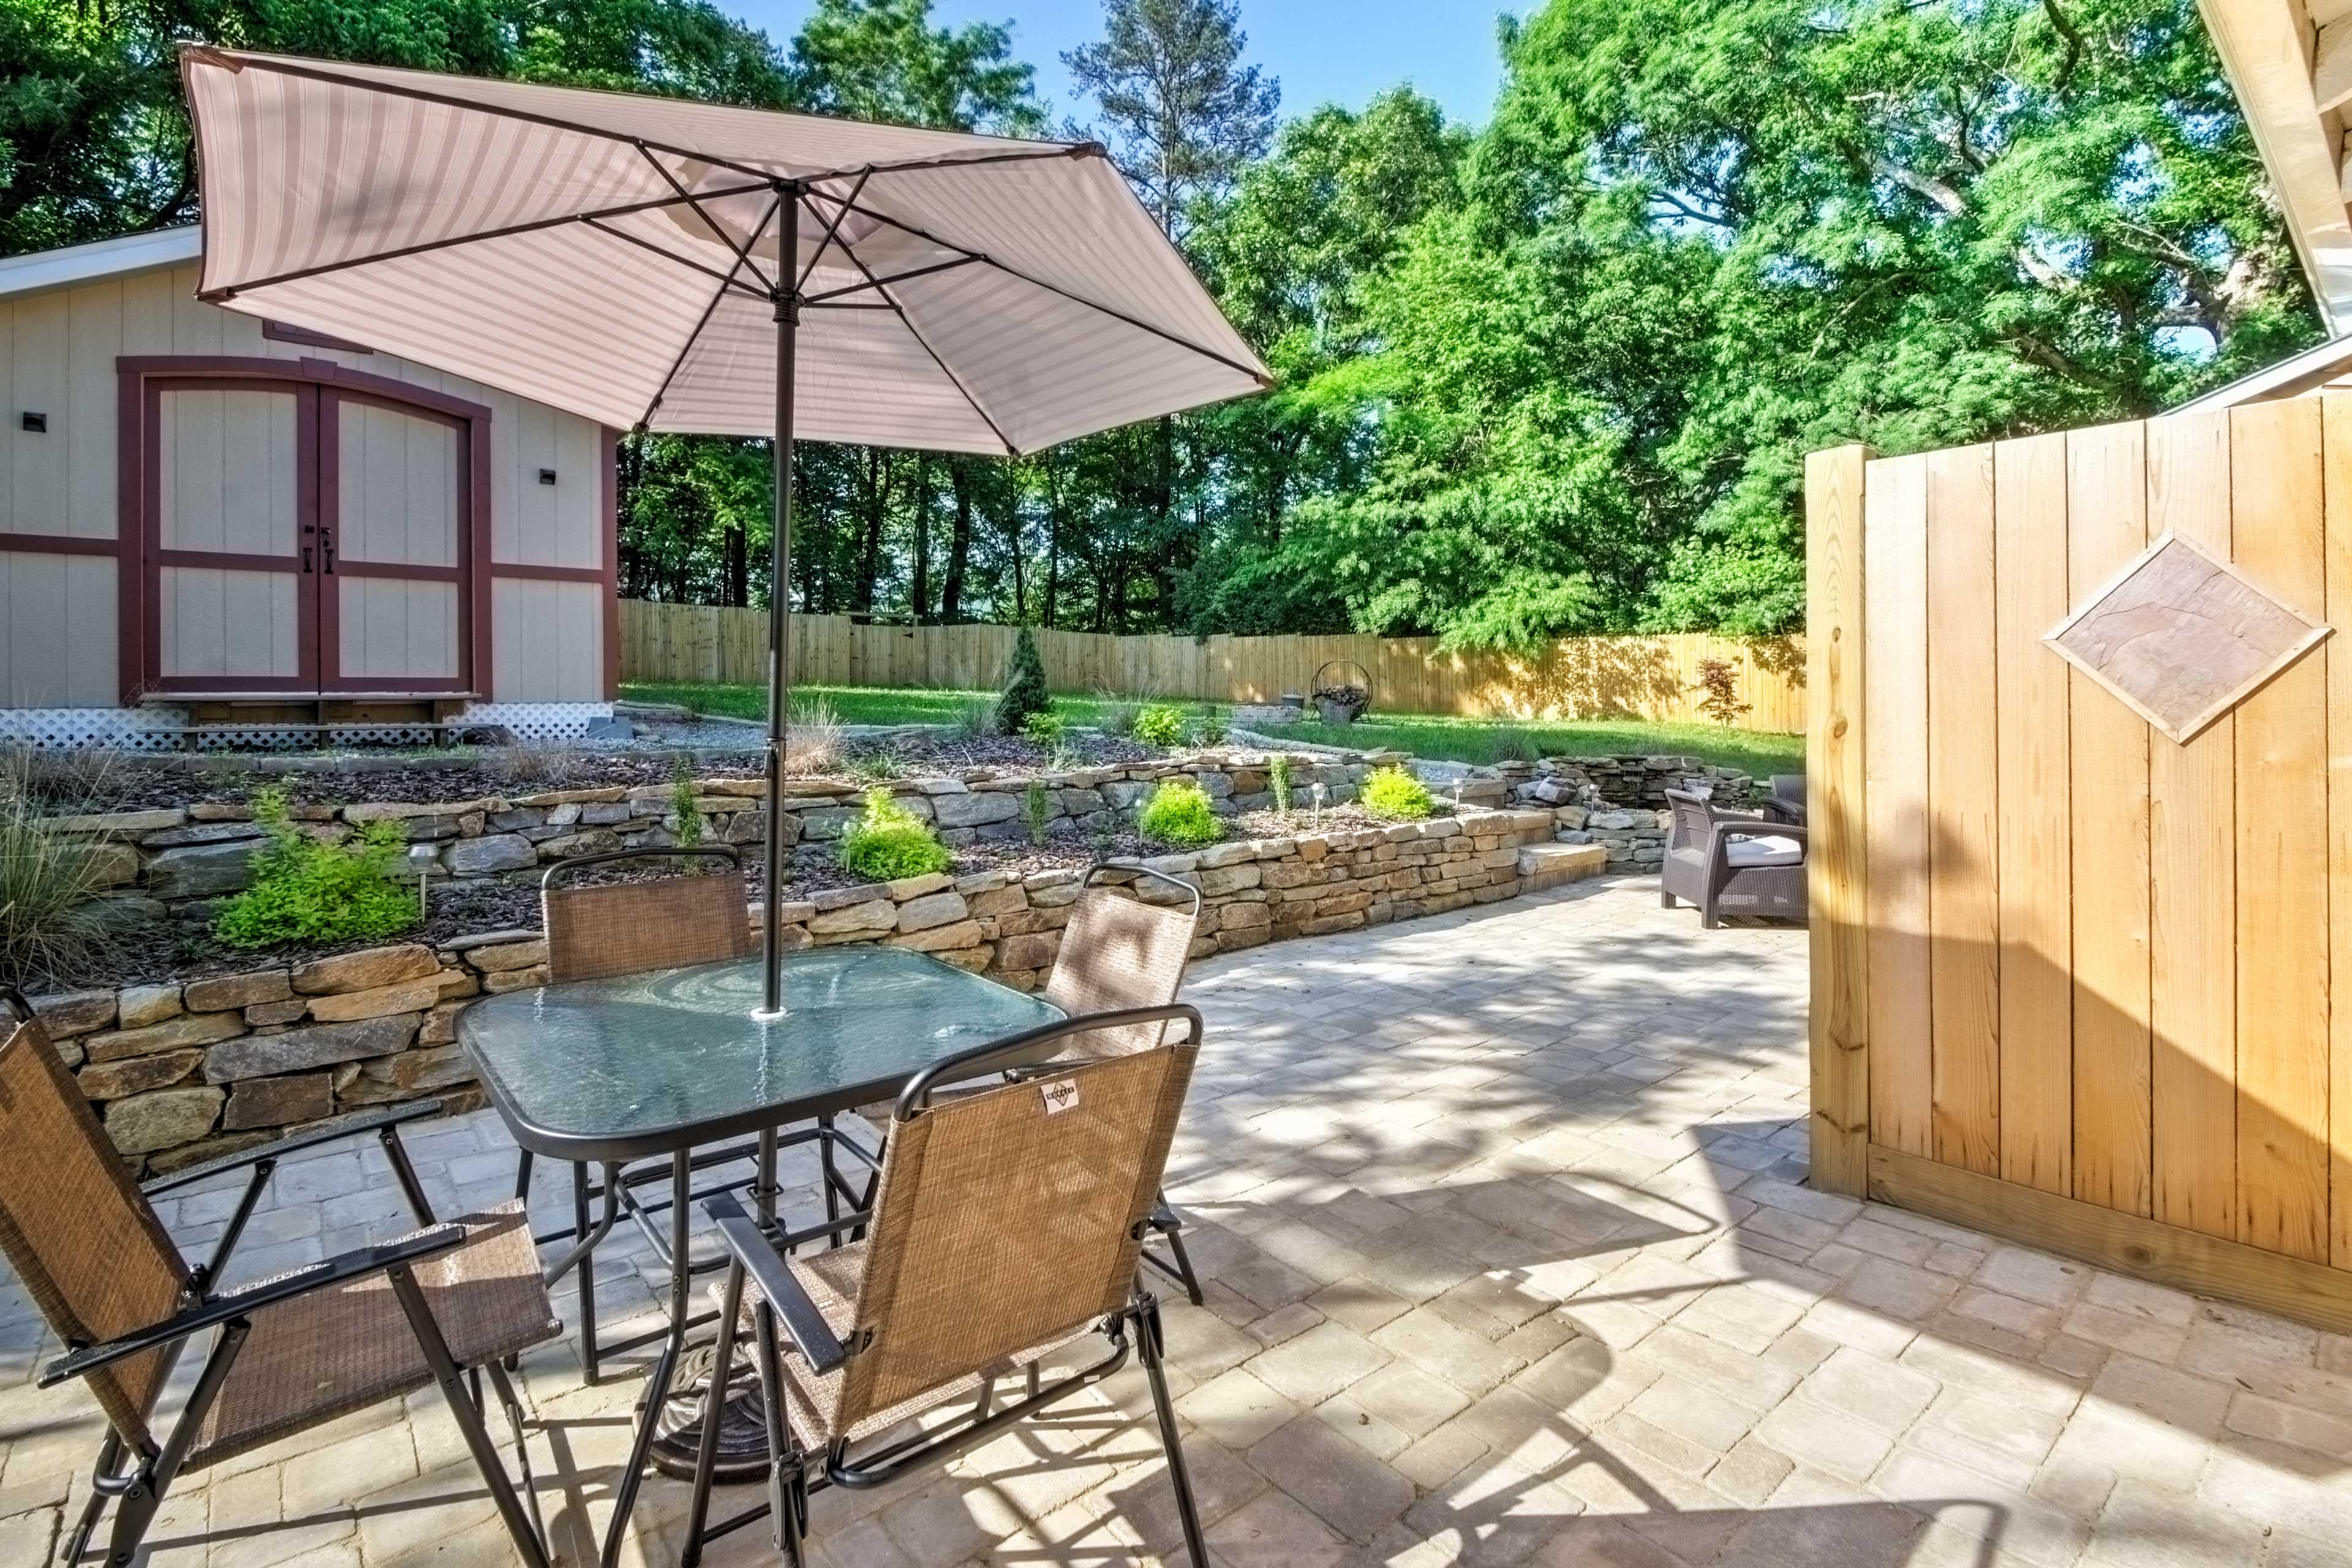 Dine al fresco in your private outdoor oasis.